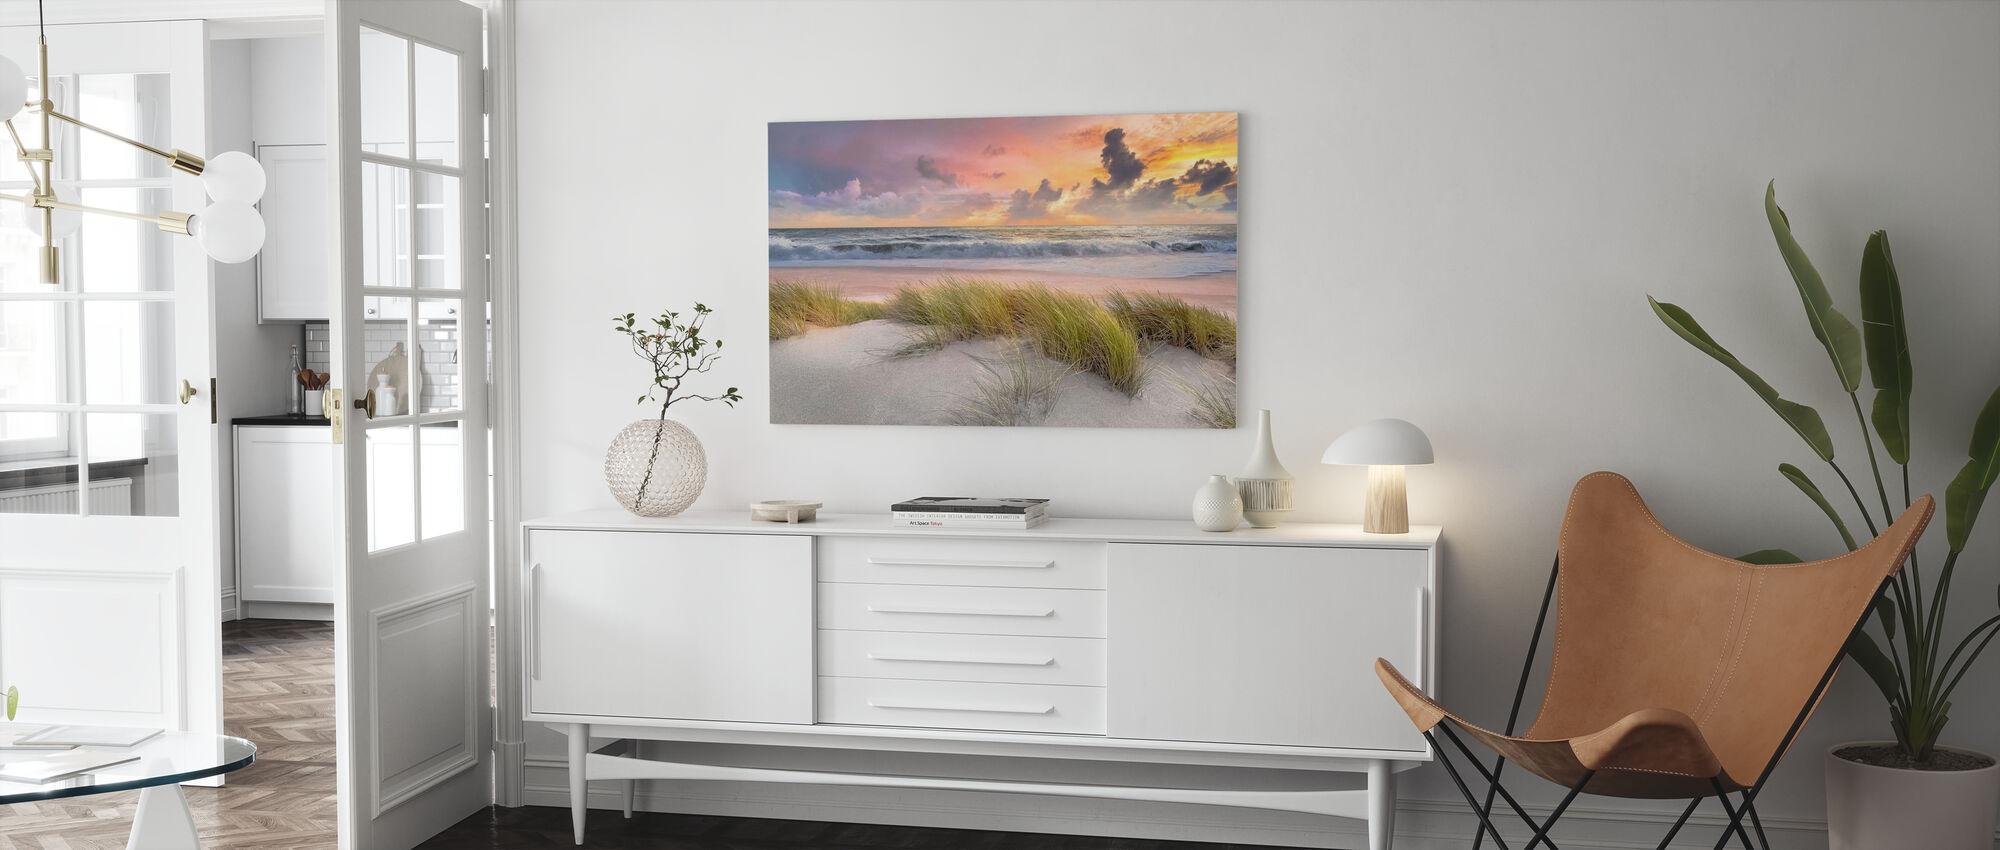 Gräs i Strandsand - Canvastavla - Vardagsrum